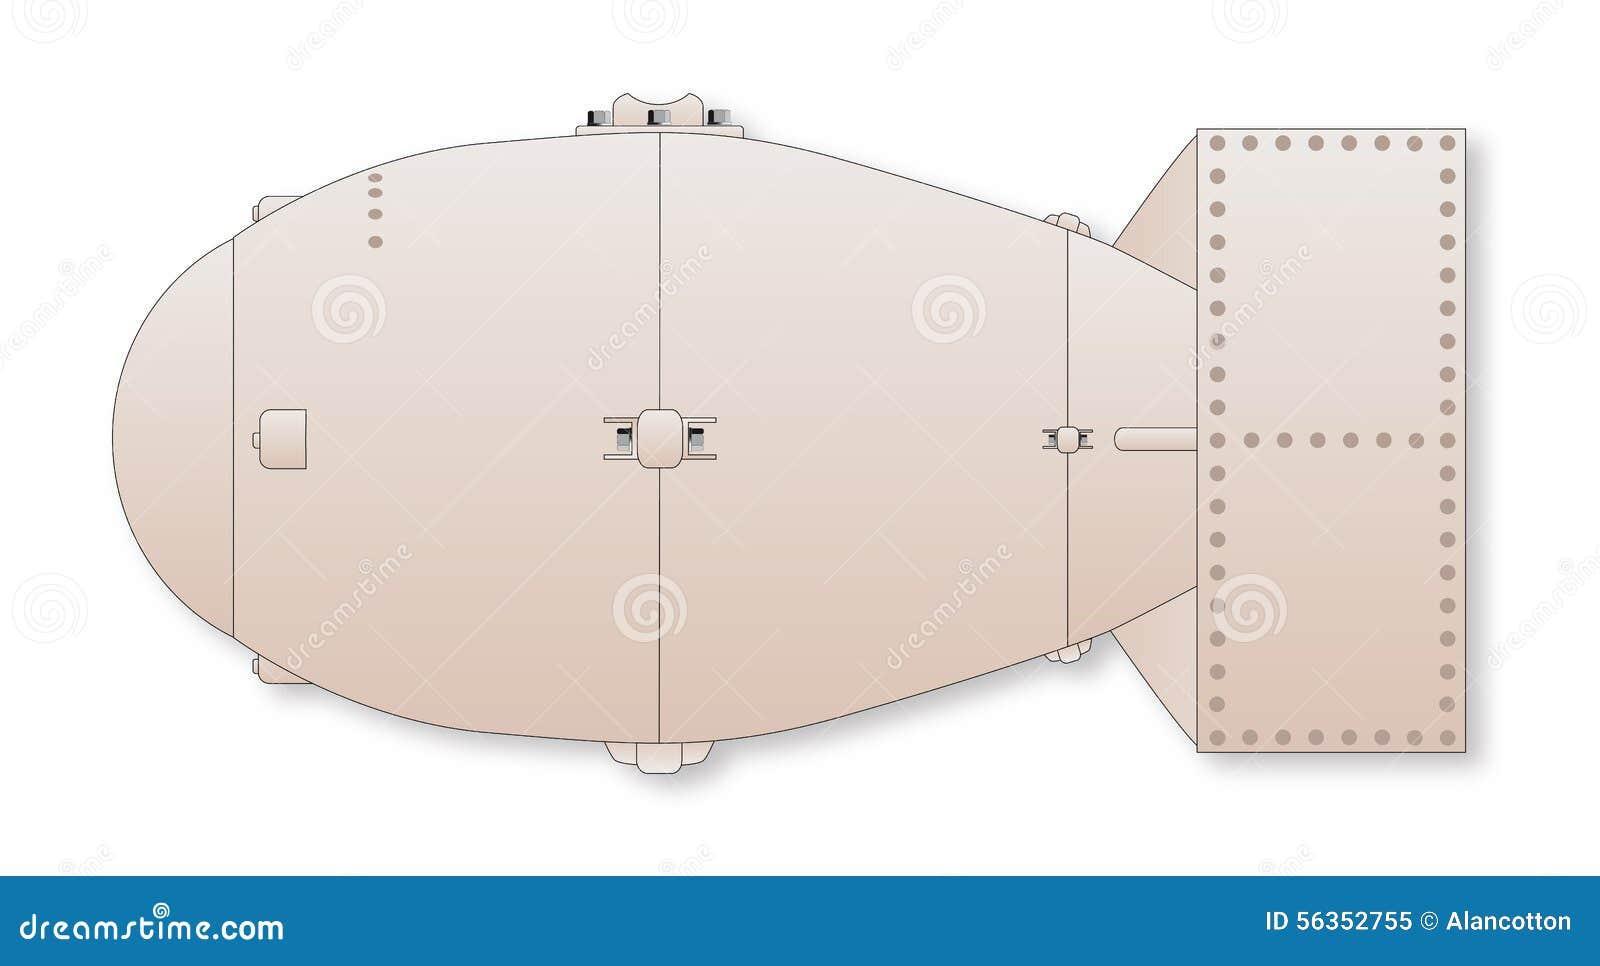 Pig cartoon royalty free stock vector art illustration male models - Fat Man Illustration Male Models Picture